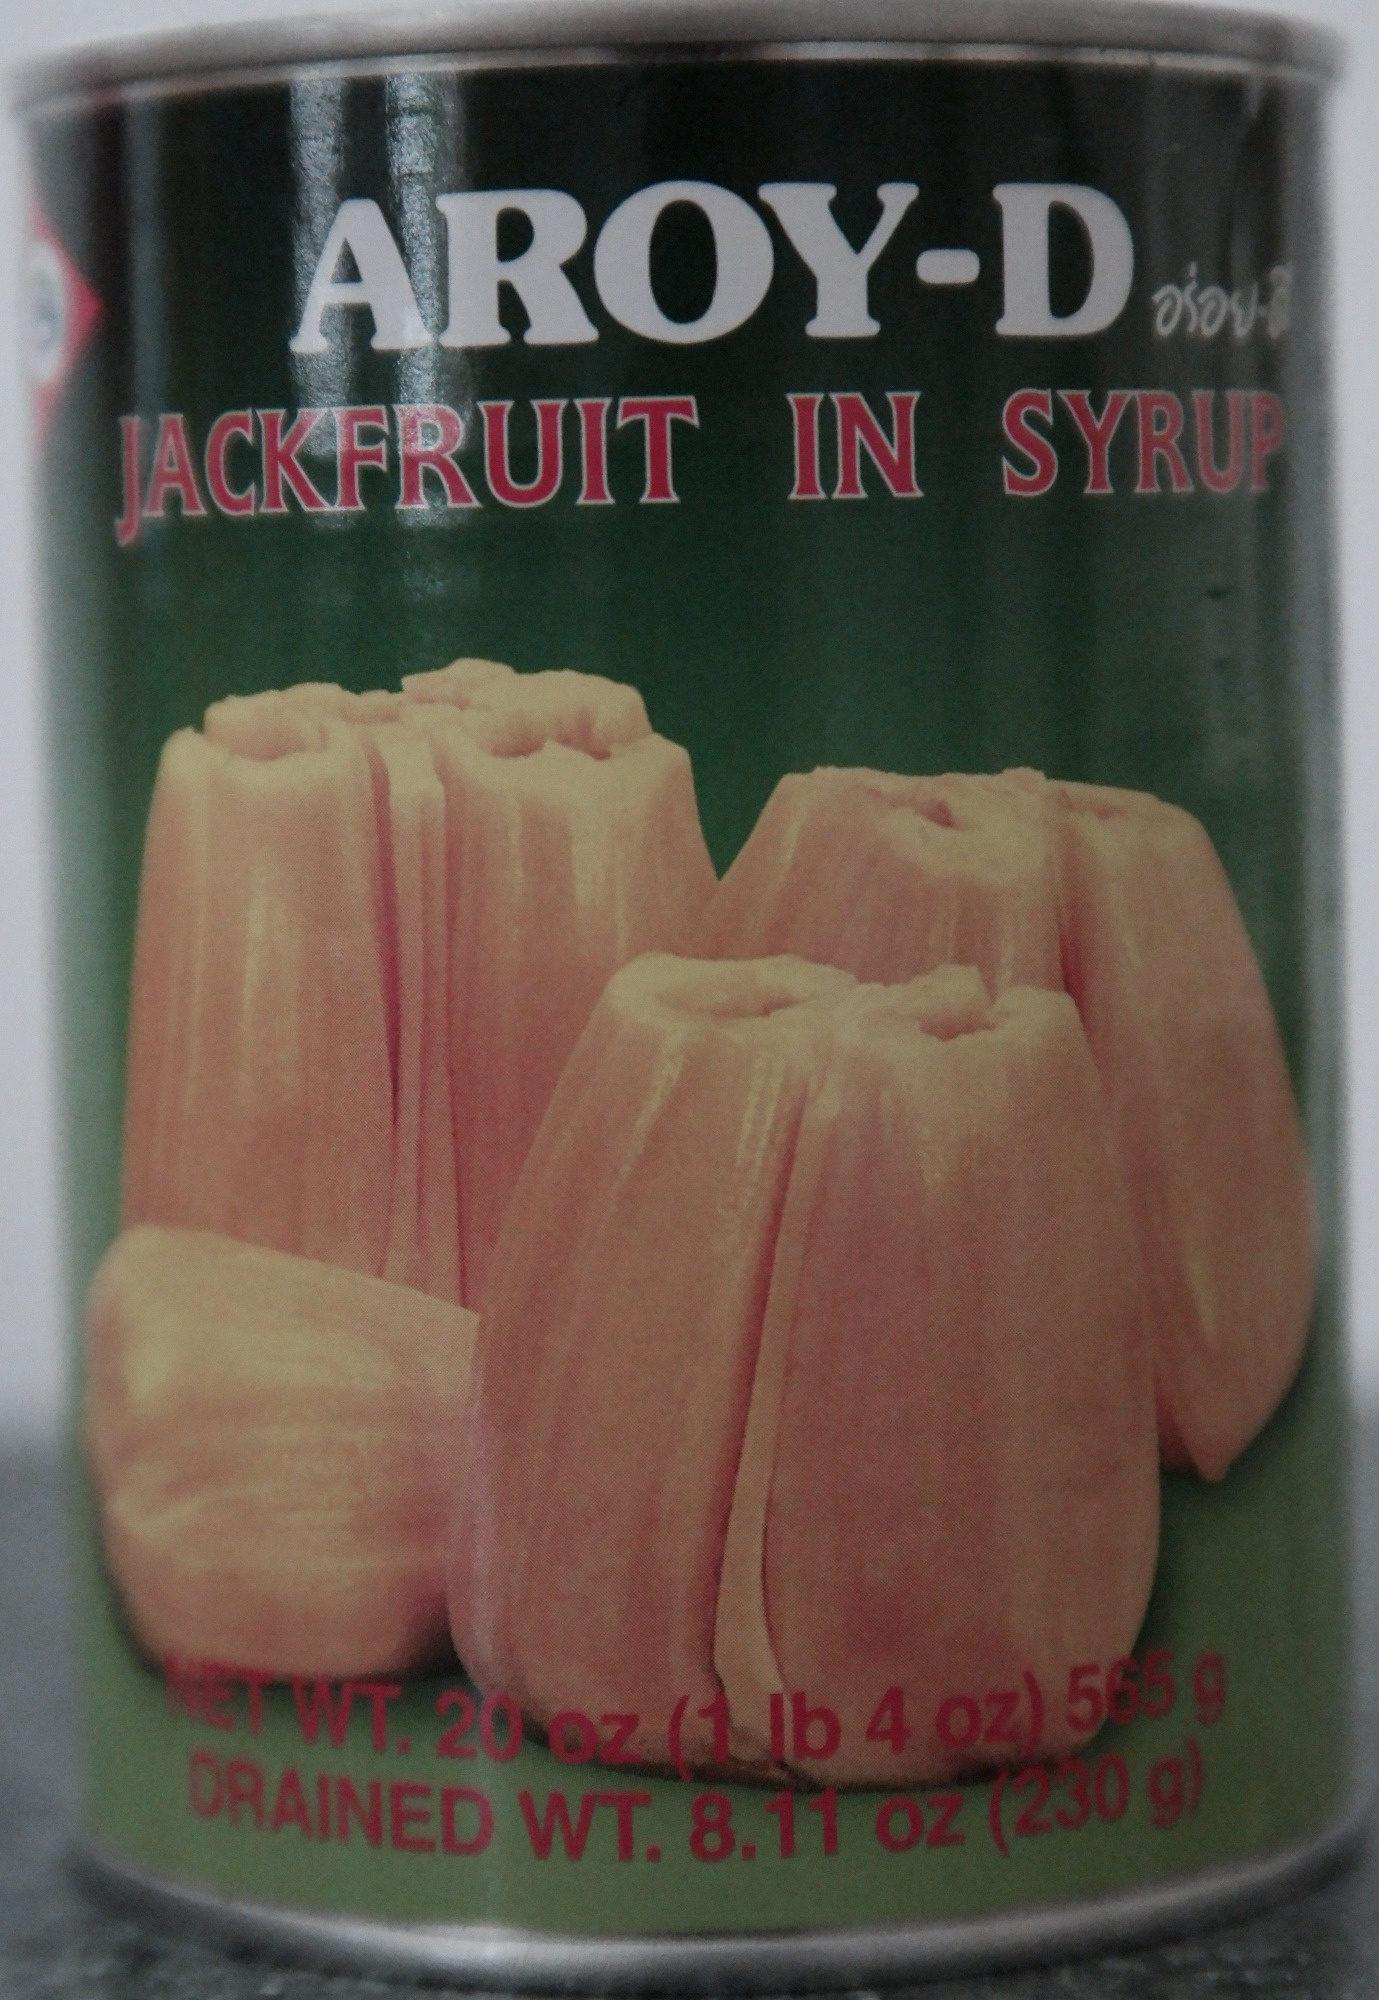 Aroy-d, jackfruit in syrup - Product - en